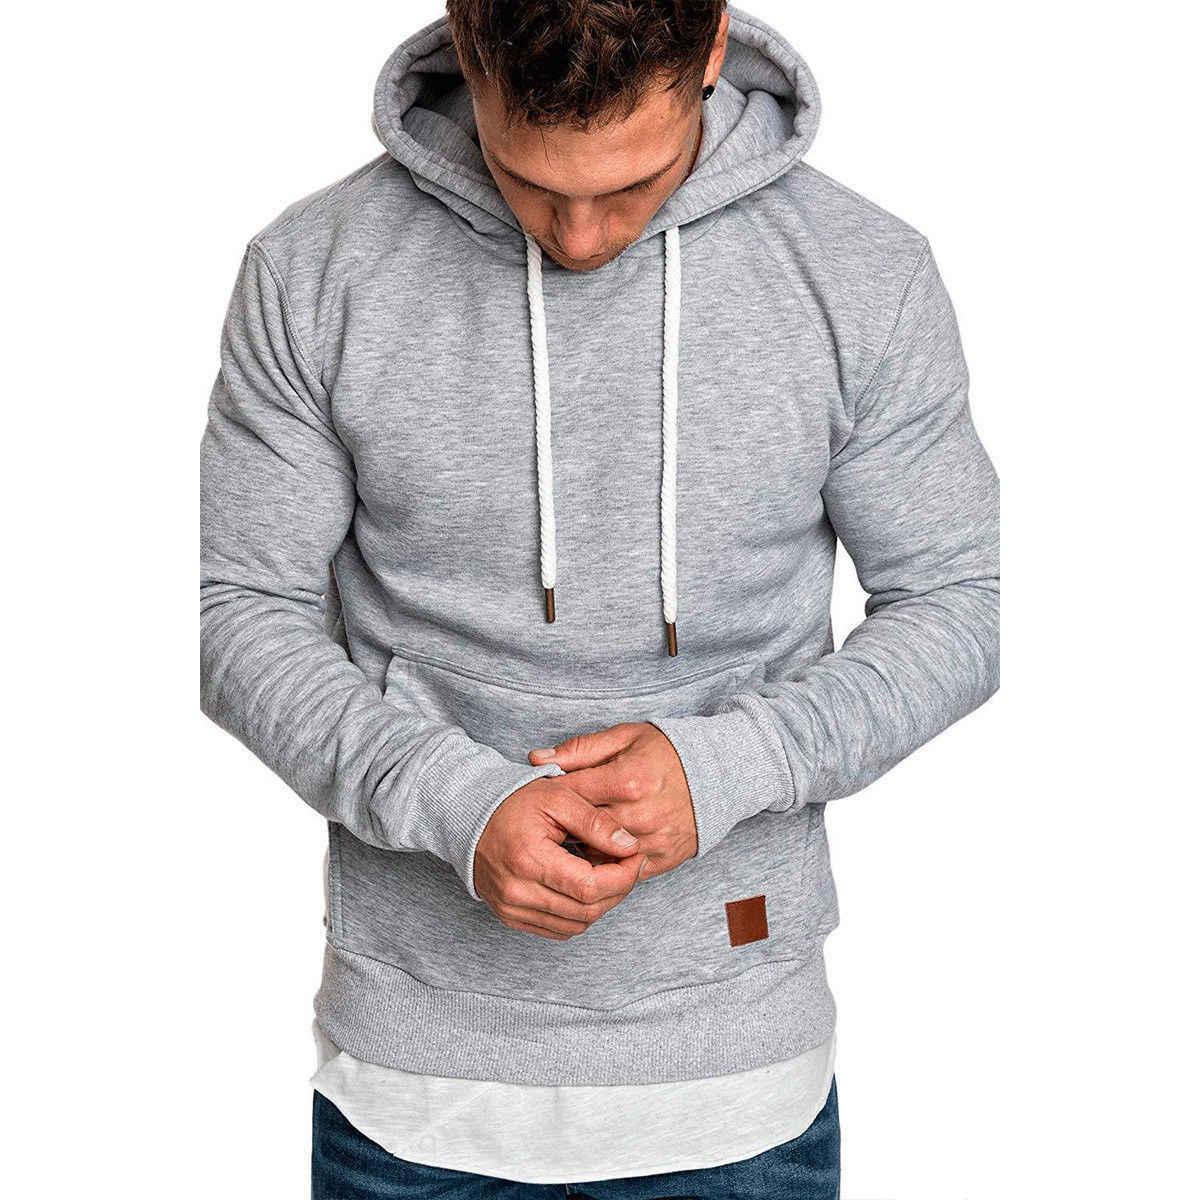 Hoodies homens casual pulôver streetwear moletom sudadera hombre harajuku capuz masculino camisolas